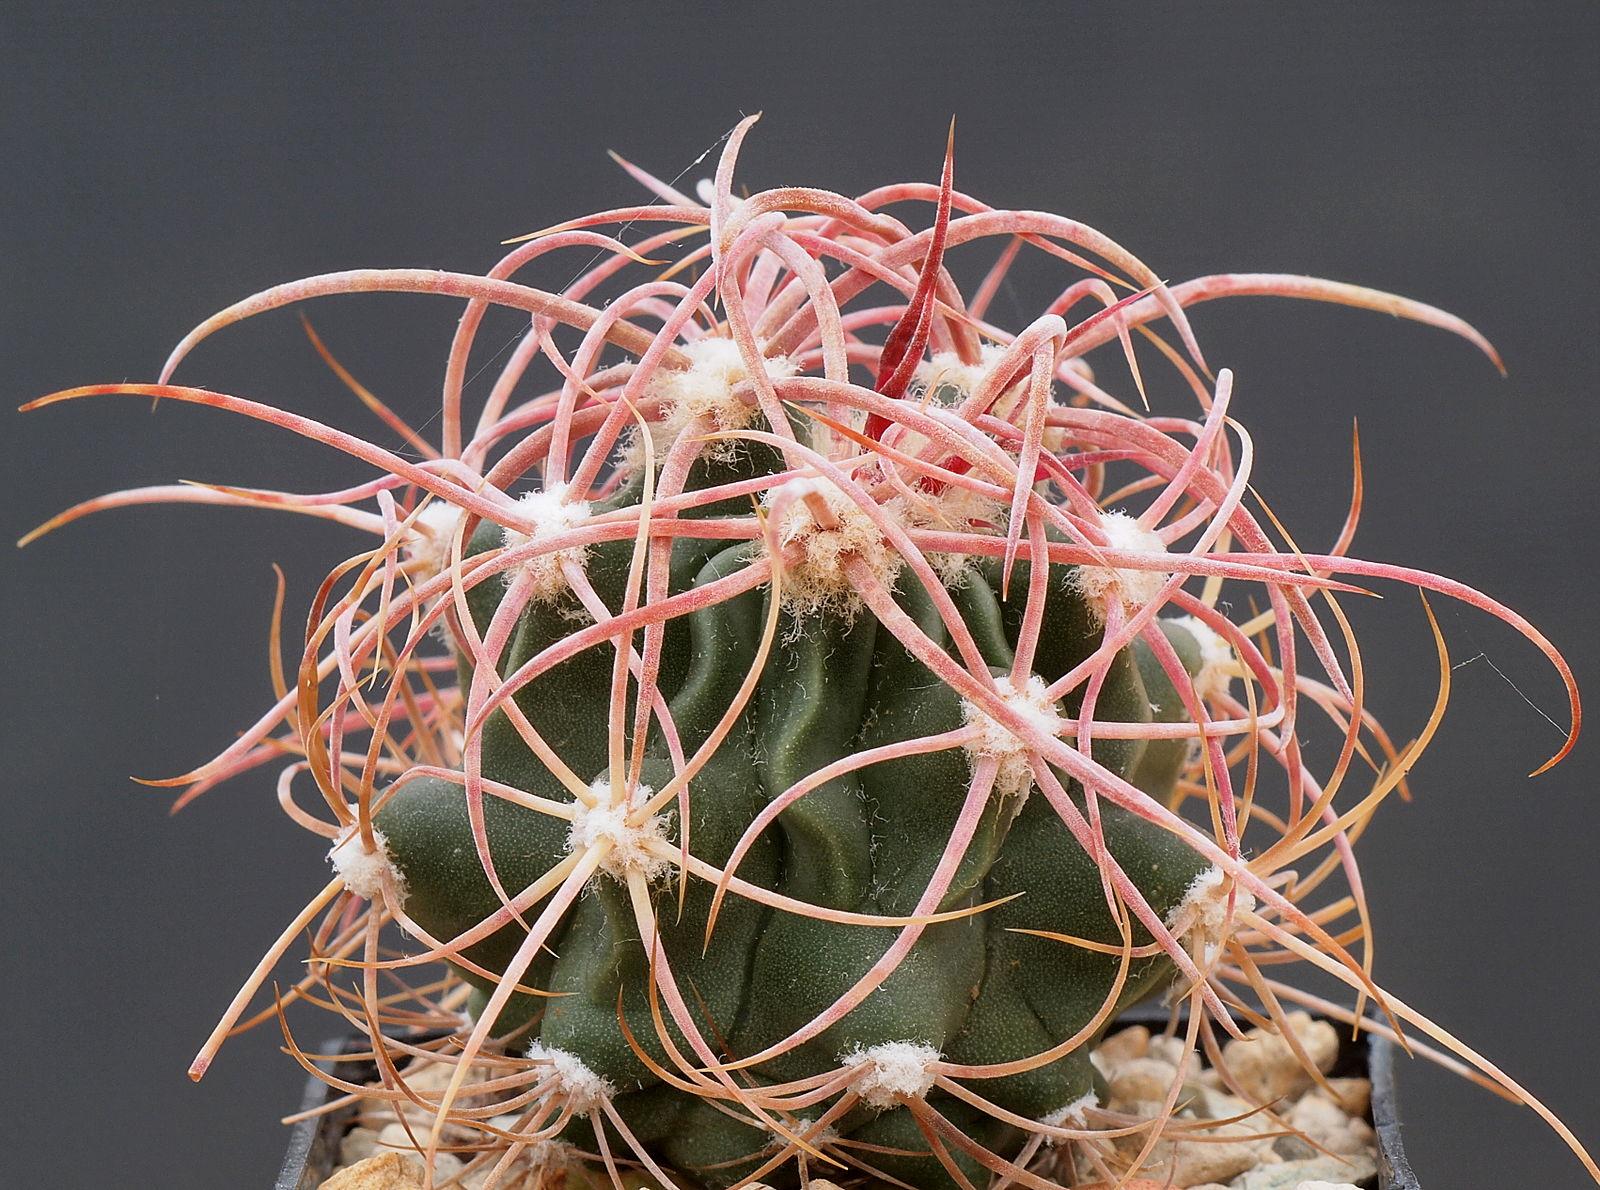 Echinocactus polycephalus, photo by Dornenwolf from Deutschland  https://commons.wikimedia.org/wiki/File:Echinocactus_polycephalus_(14737872158).jpg